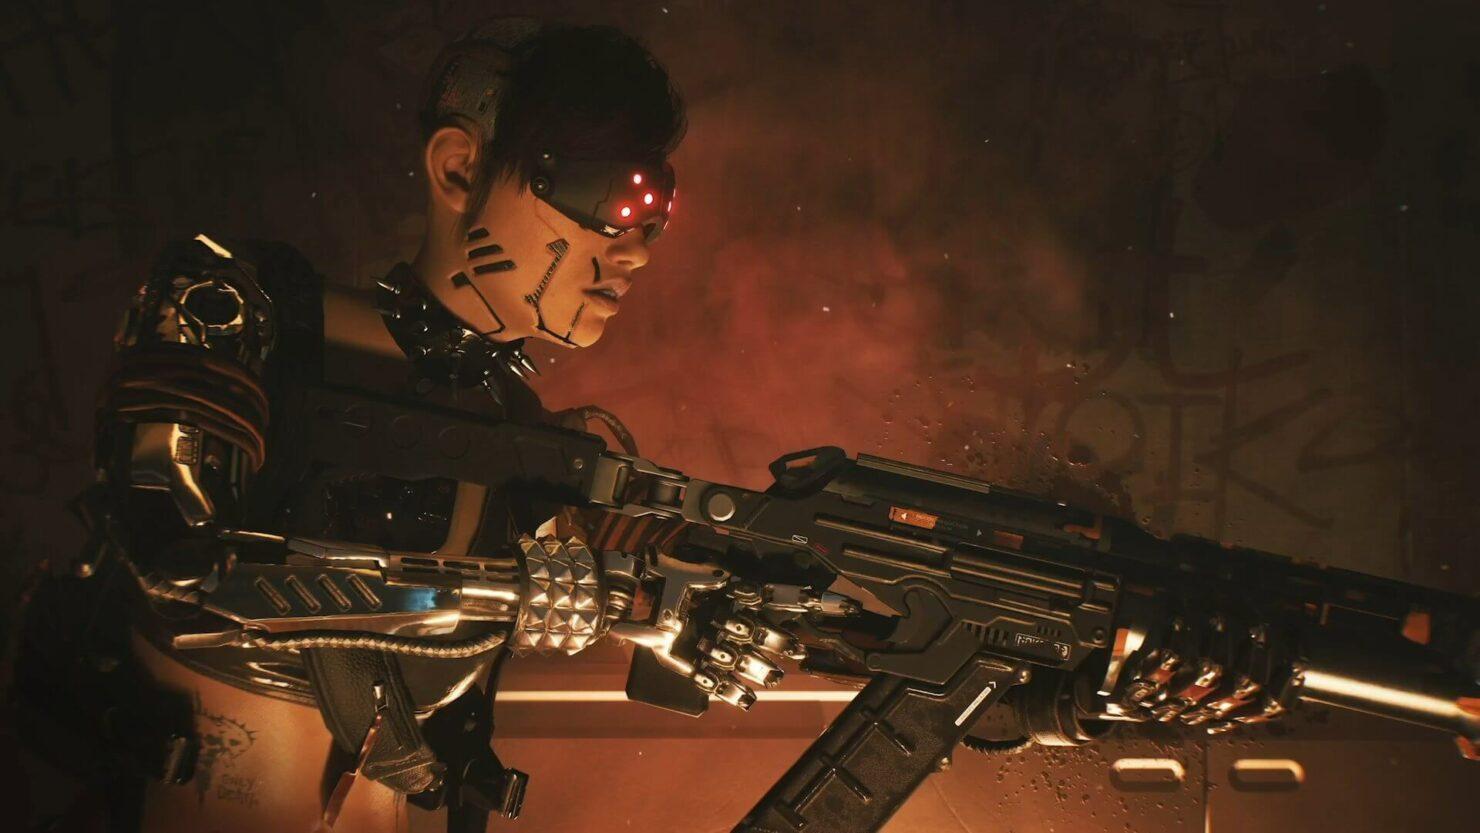 cyberpunk-2077-jun-25th-screenshots-8